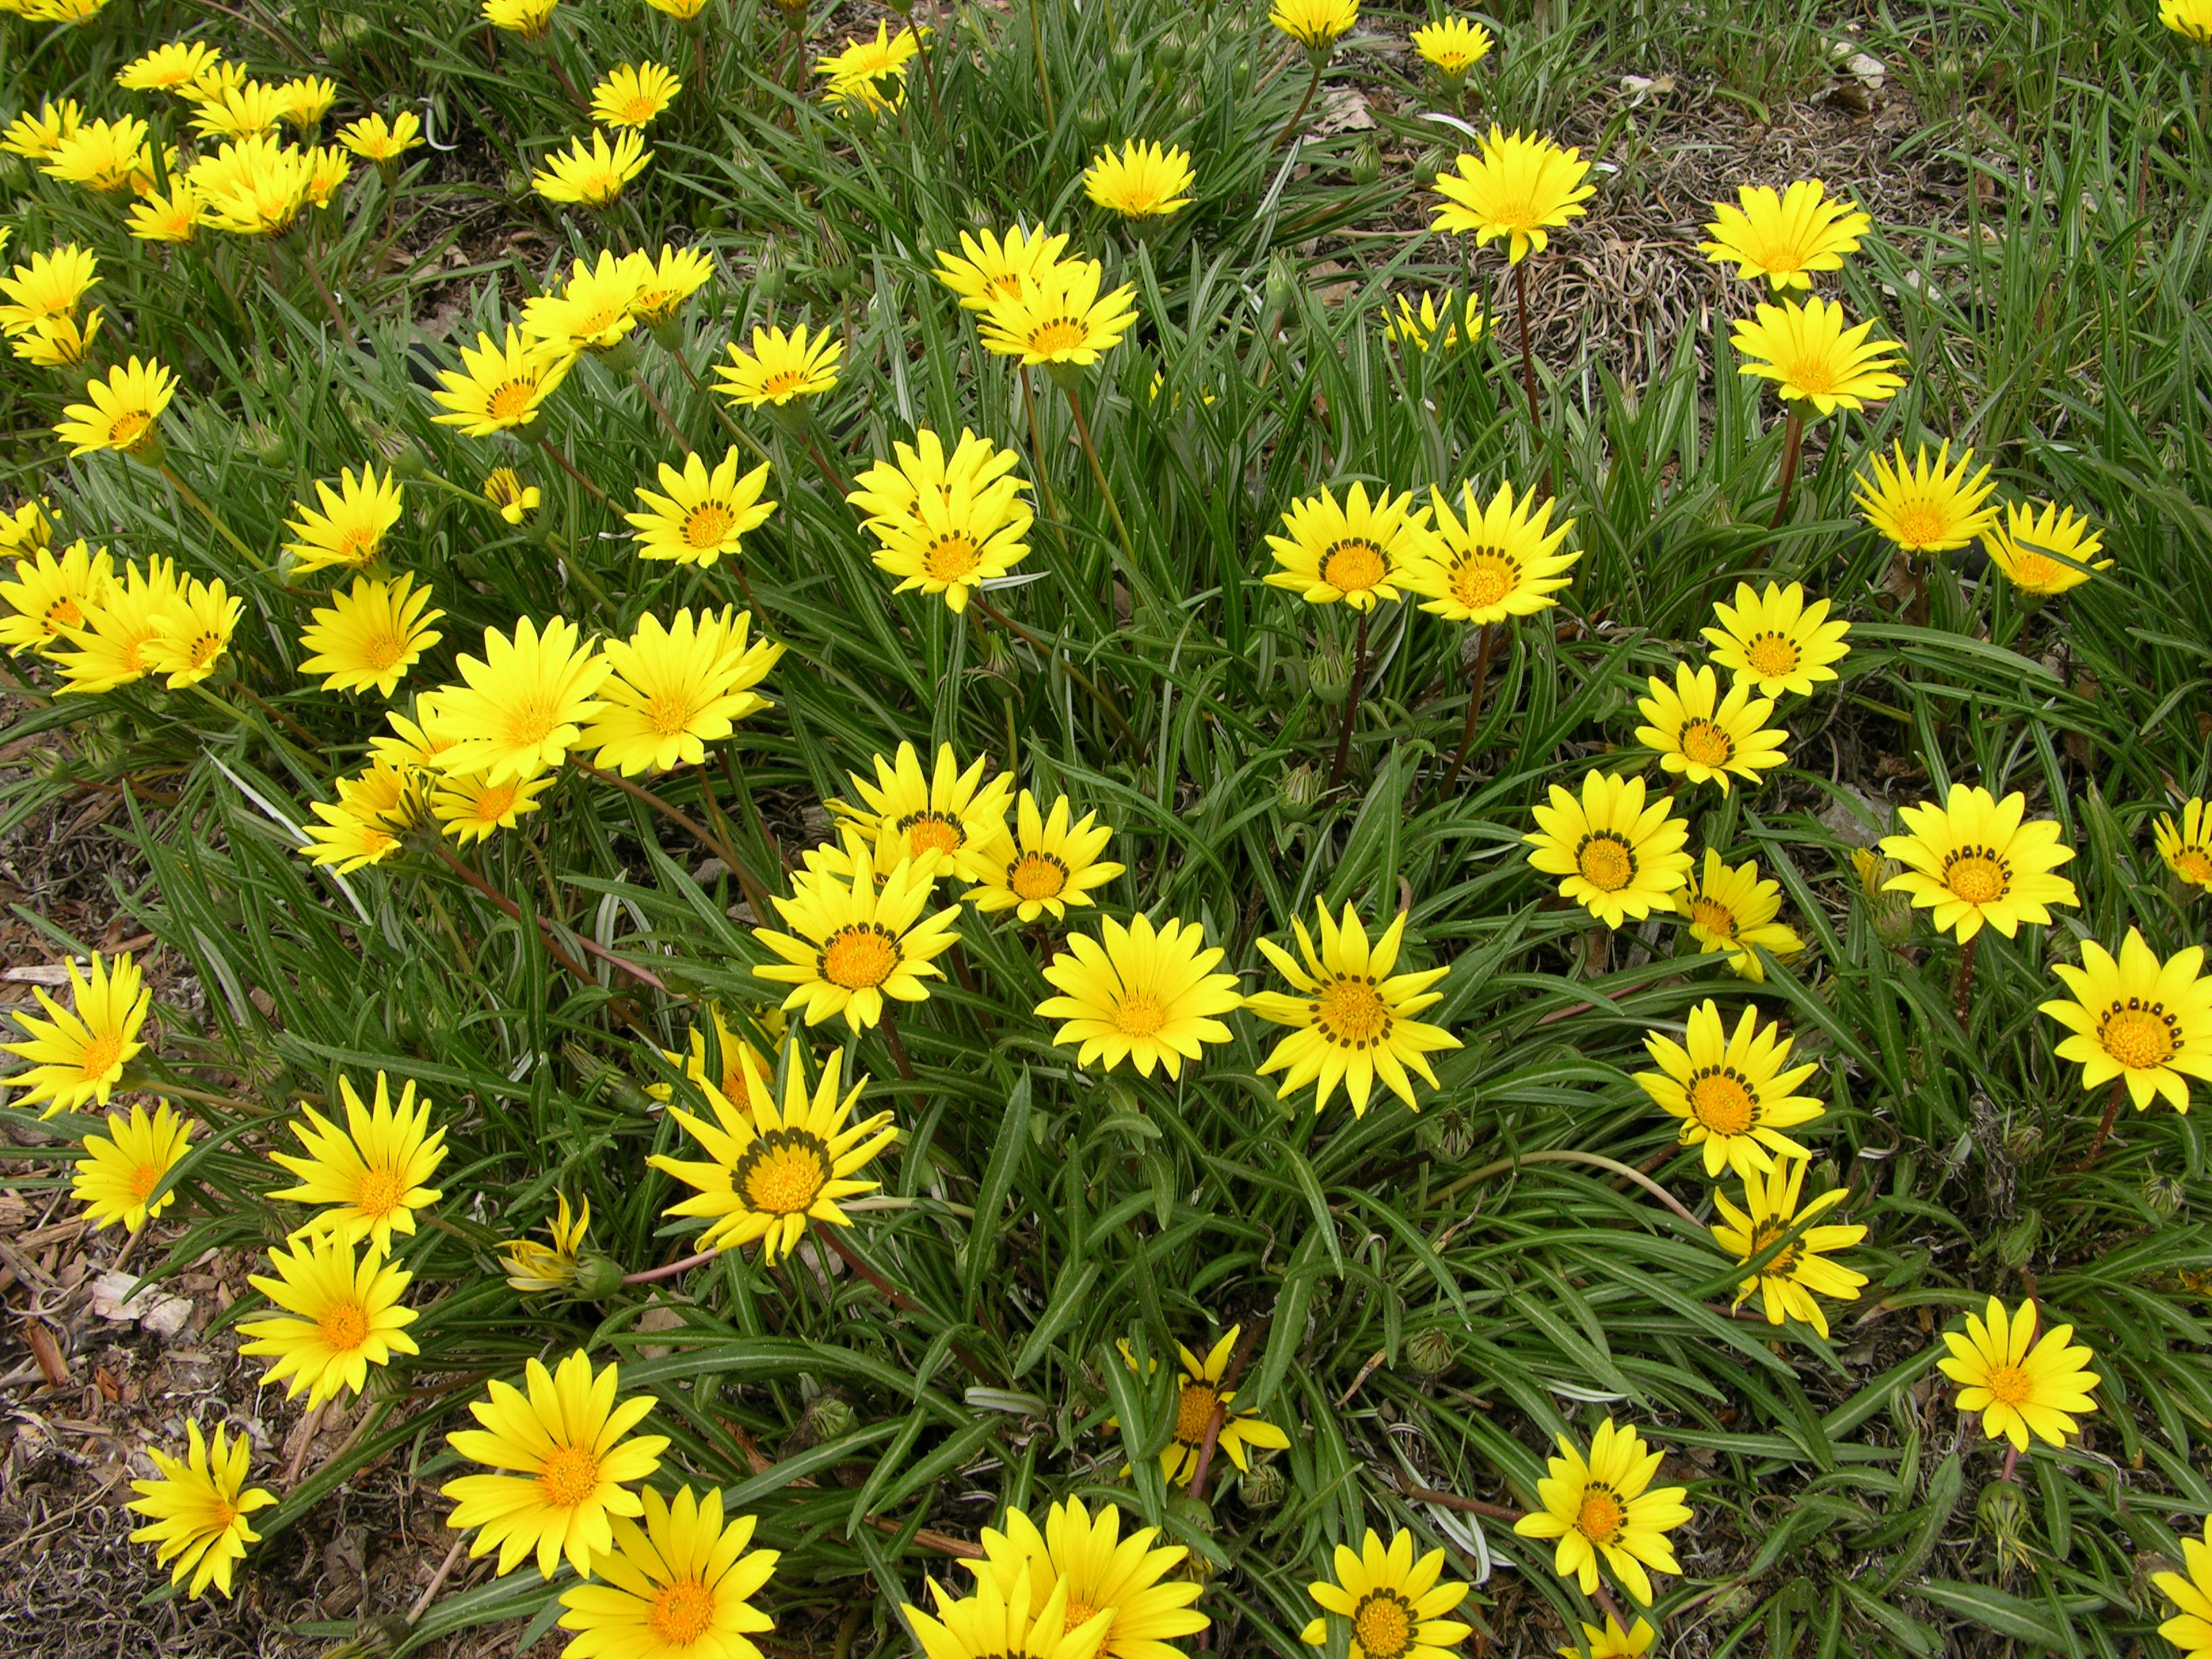 Colorado Gold Ganzia Side Yardsfront Yardslandscaping Plantsoutdoor Landscapingwater Plantsshade